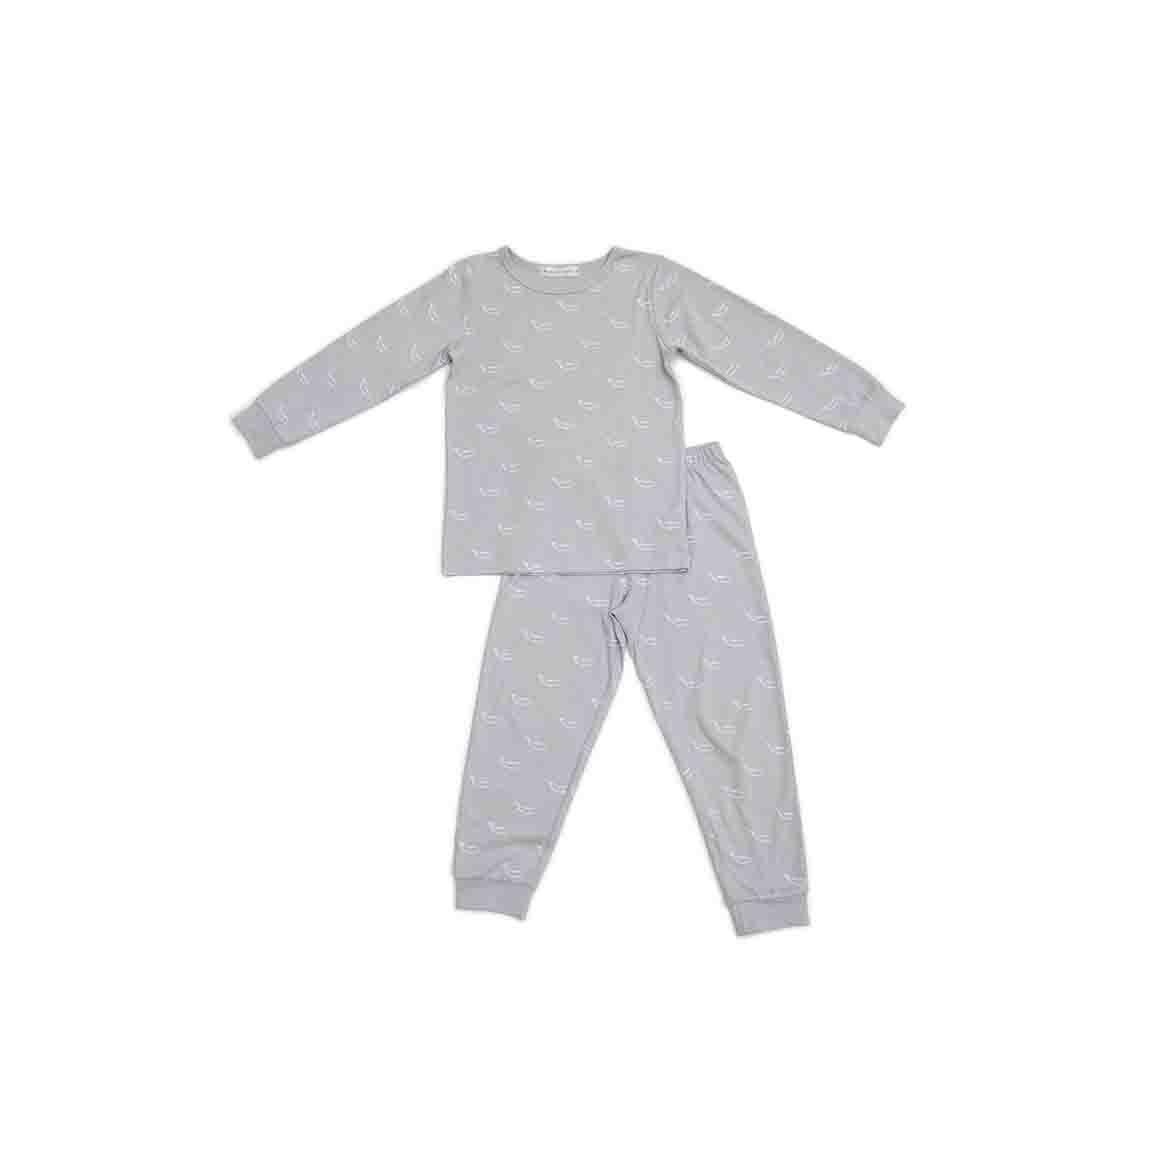 Autumn/Winter Childrens Pyjama Set - Soft Stone Grey in Tiny Whales Print   Trada Marketplace